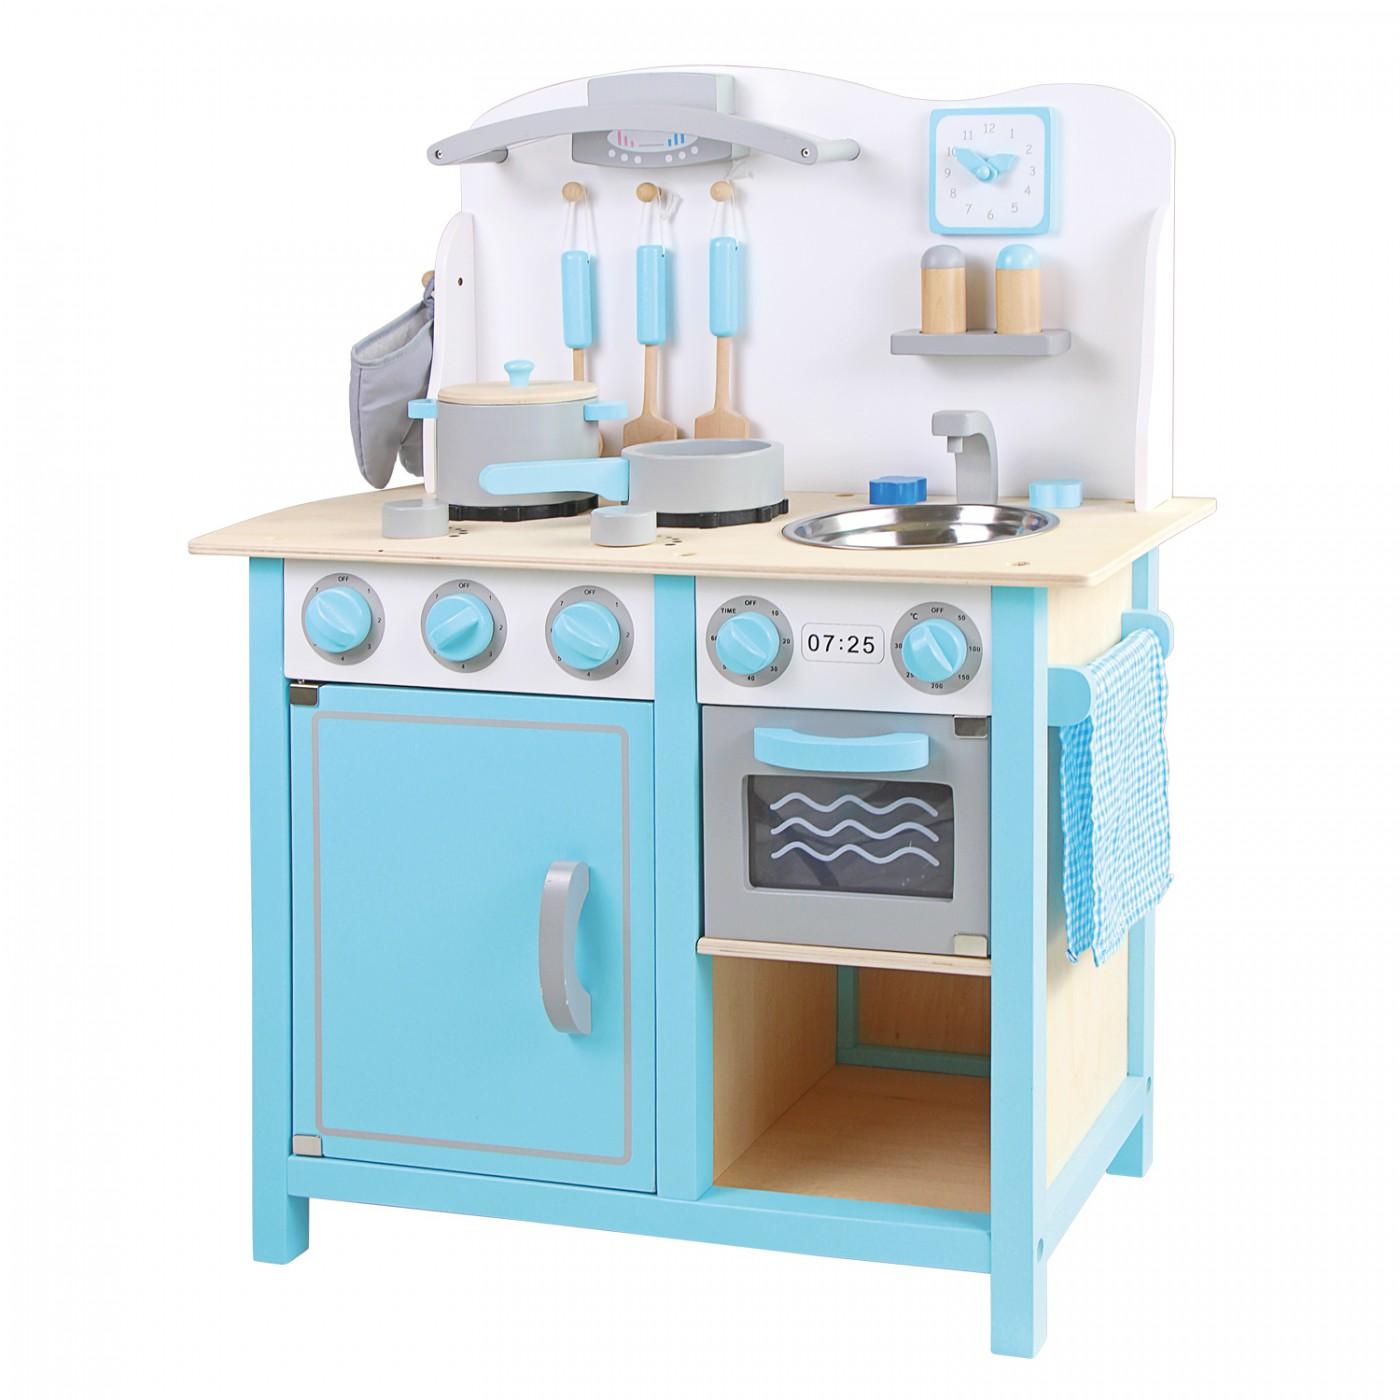 Küchenzeile - Bon Appetit - DeLuxe blau